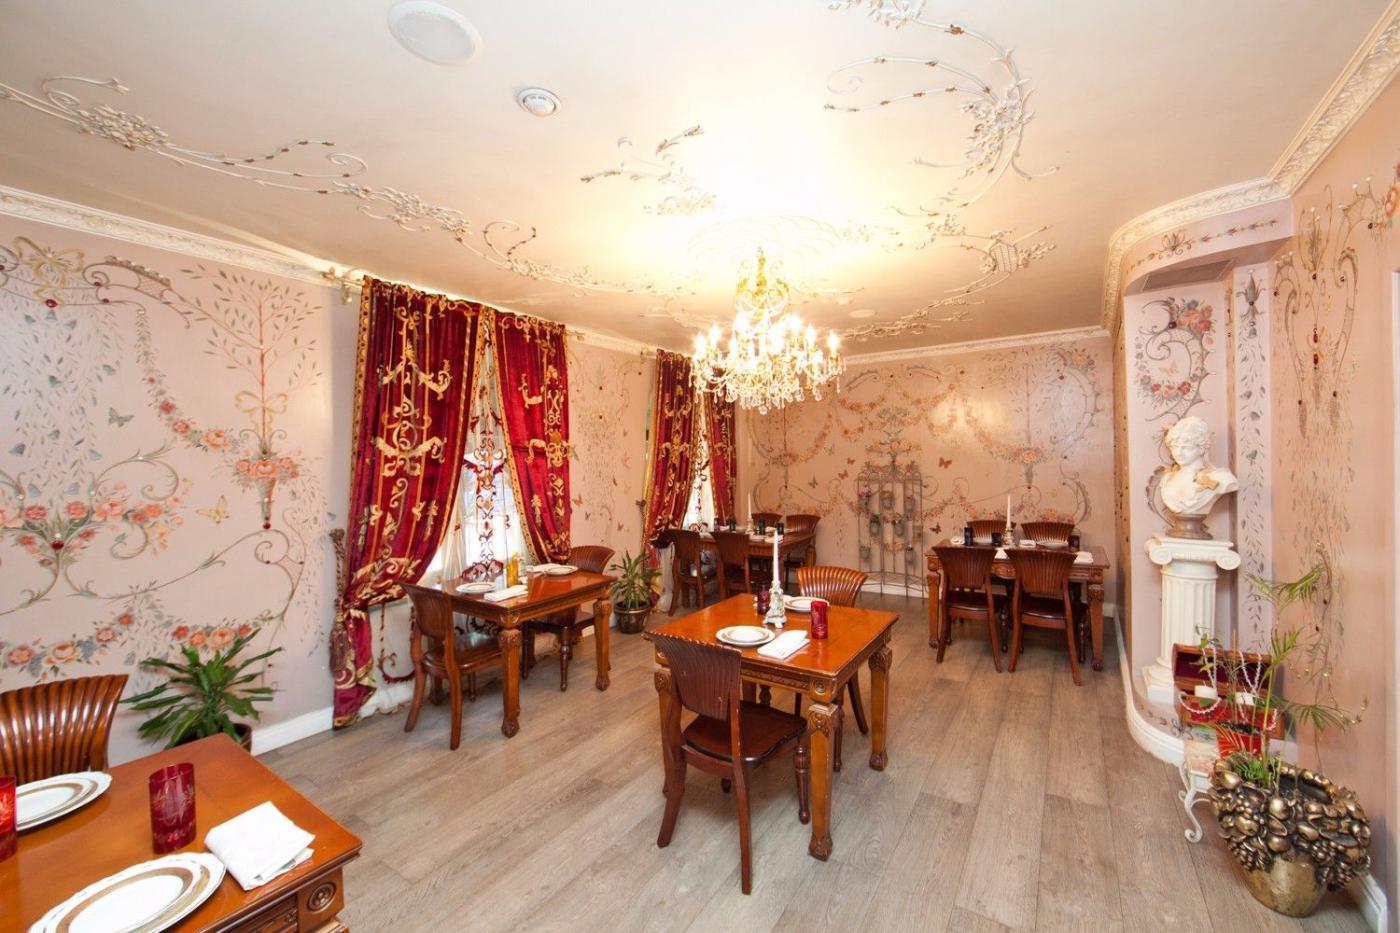 Грузинский Ресторан Готиназа на Арбате (Gotinaza) фото 6